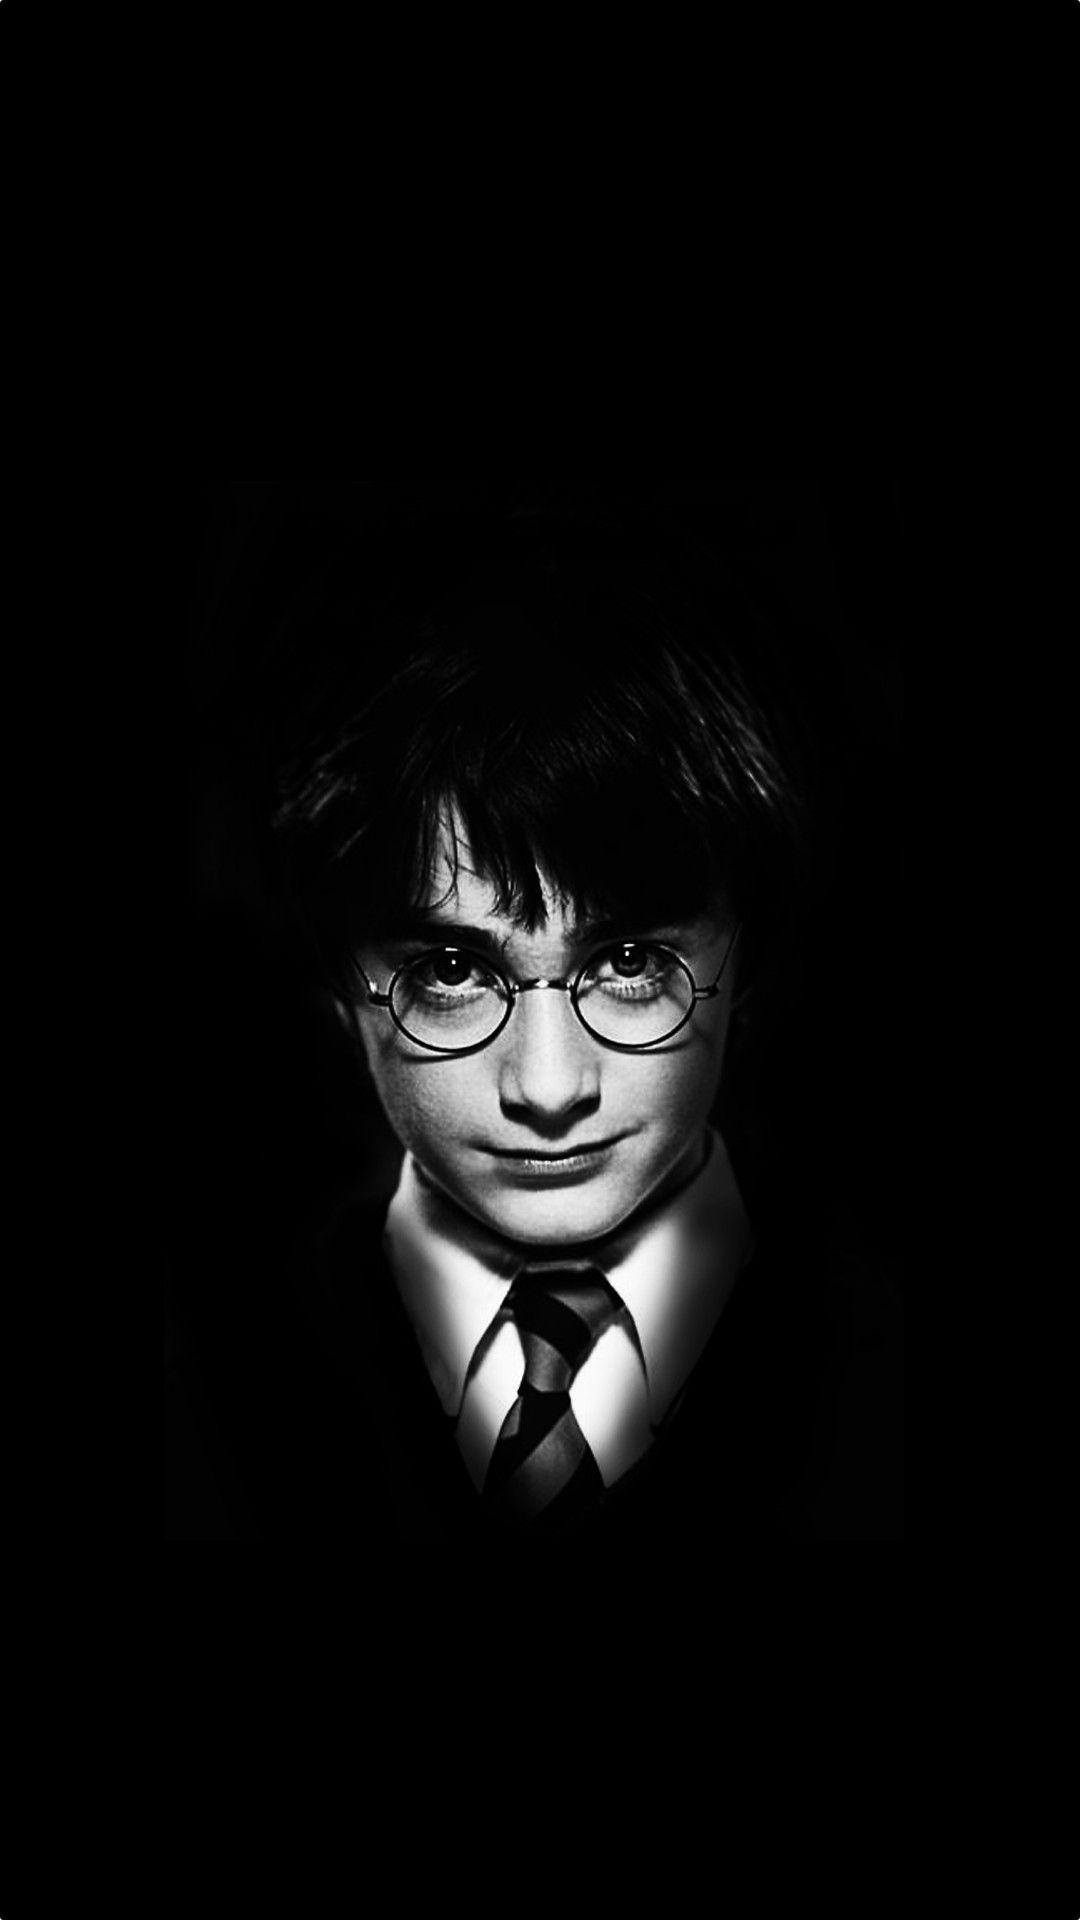 Great Wallpaper Harry Potter Black - bd87723a3bf9b93e345bd4bfb3998168  HD_549314.jpg